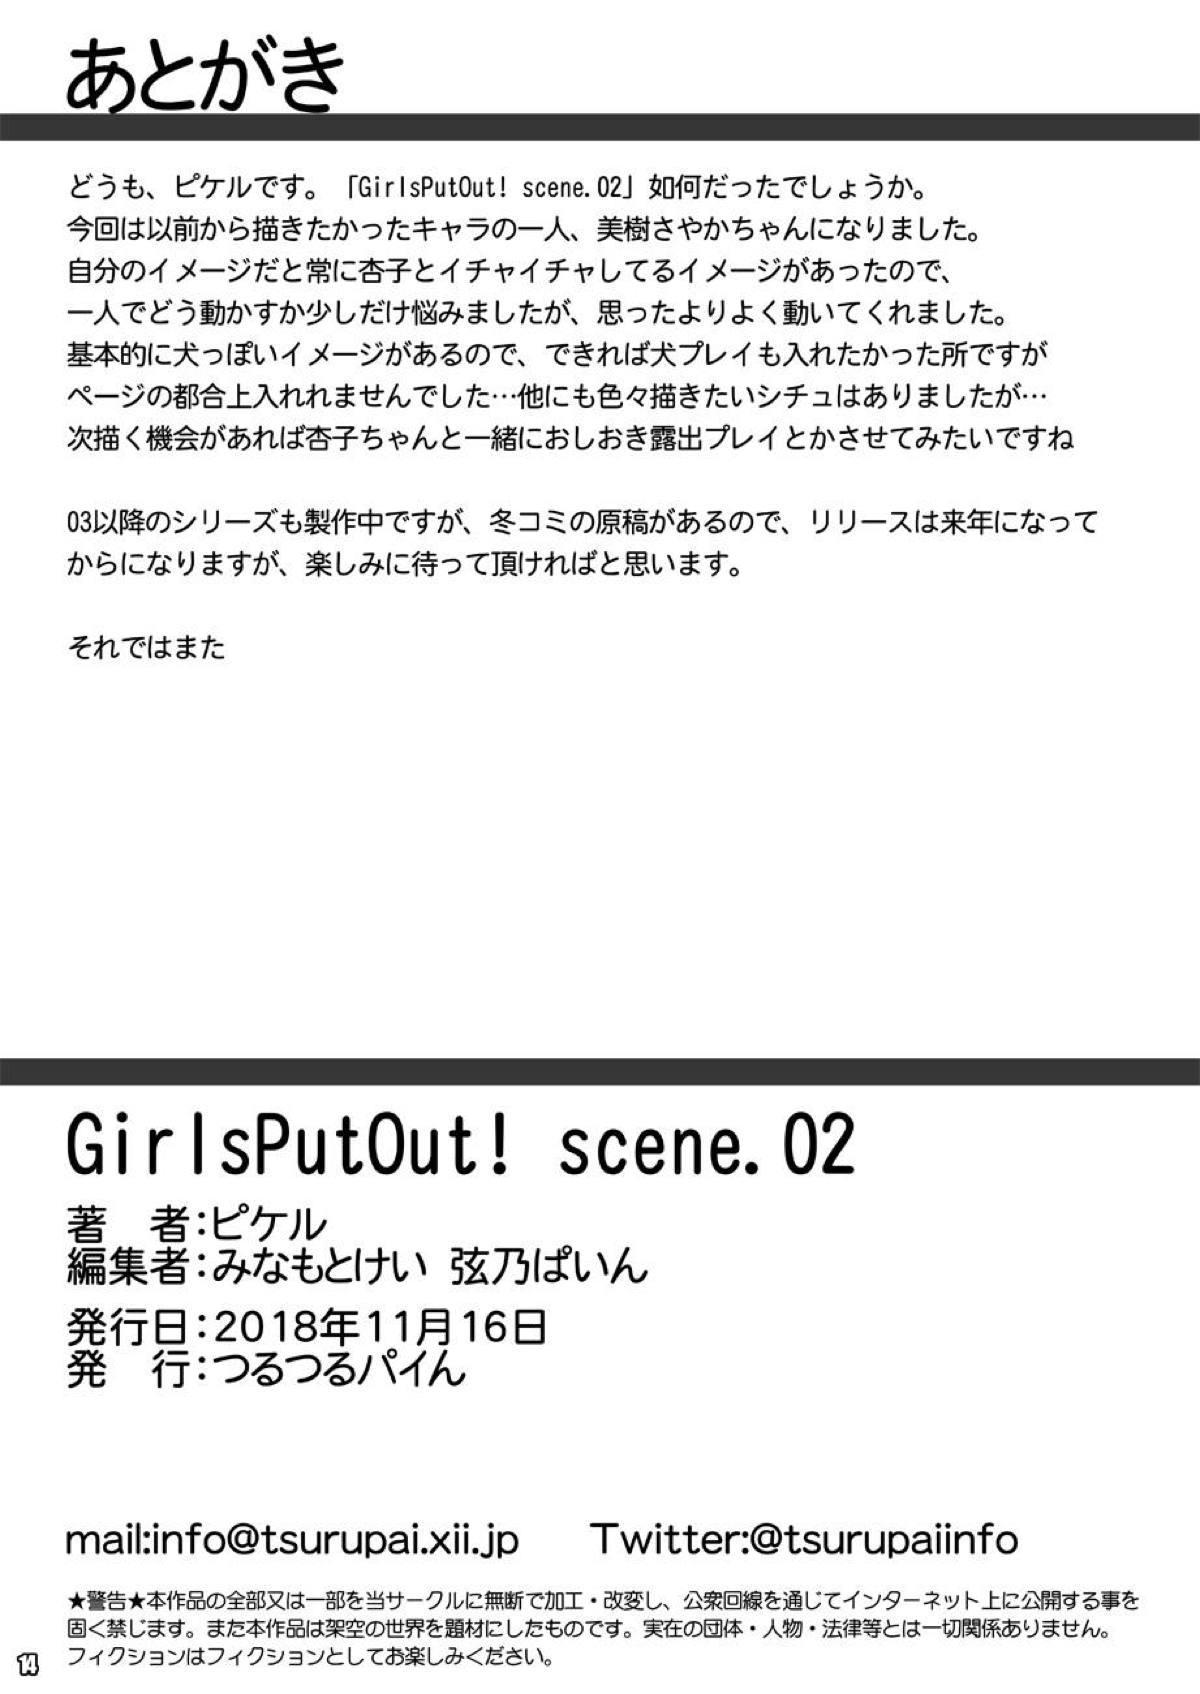 GirlsPutOut! scene.02 12